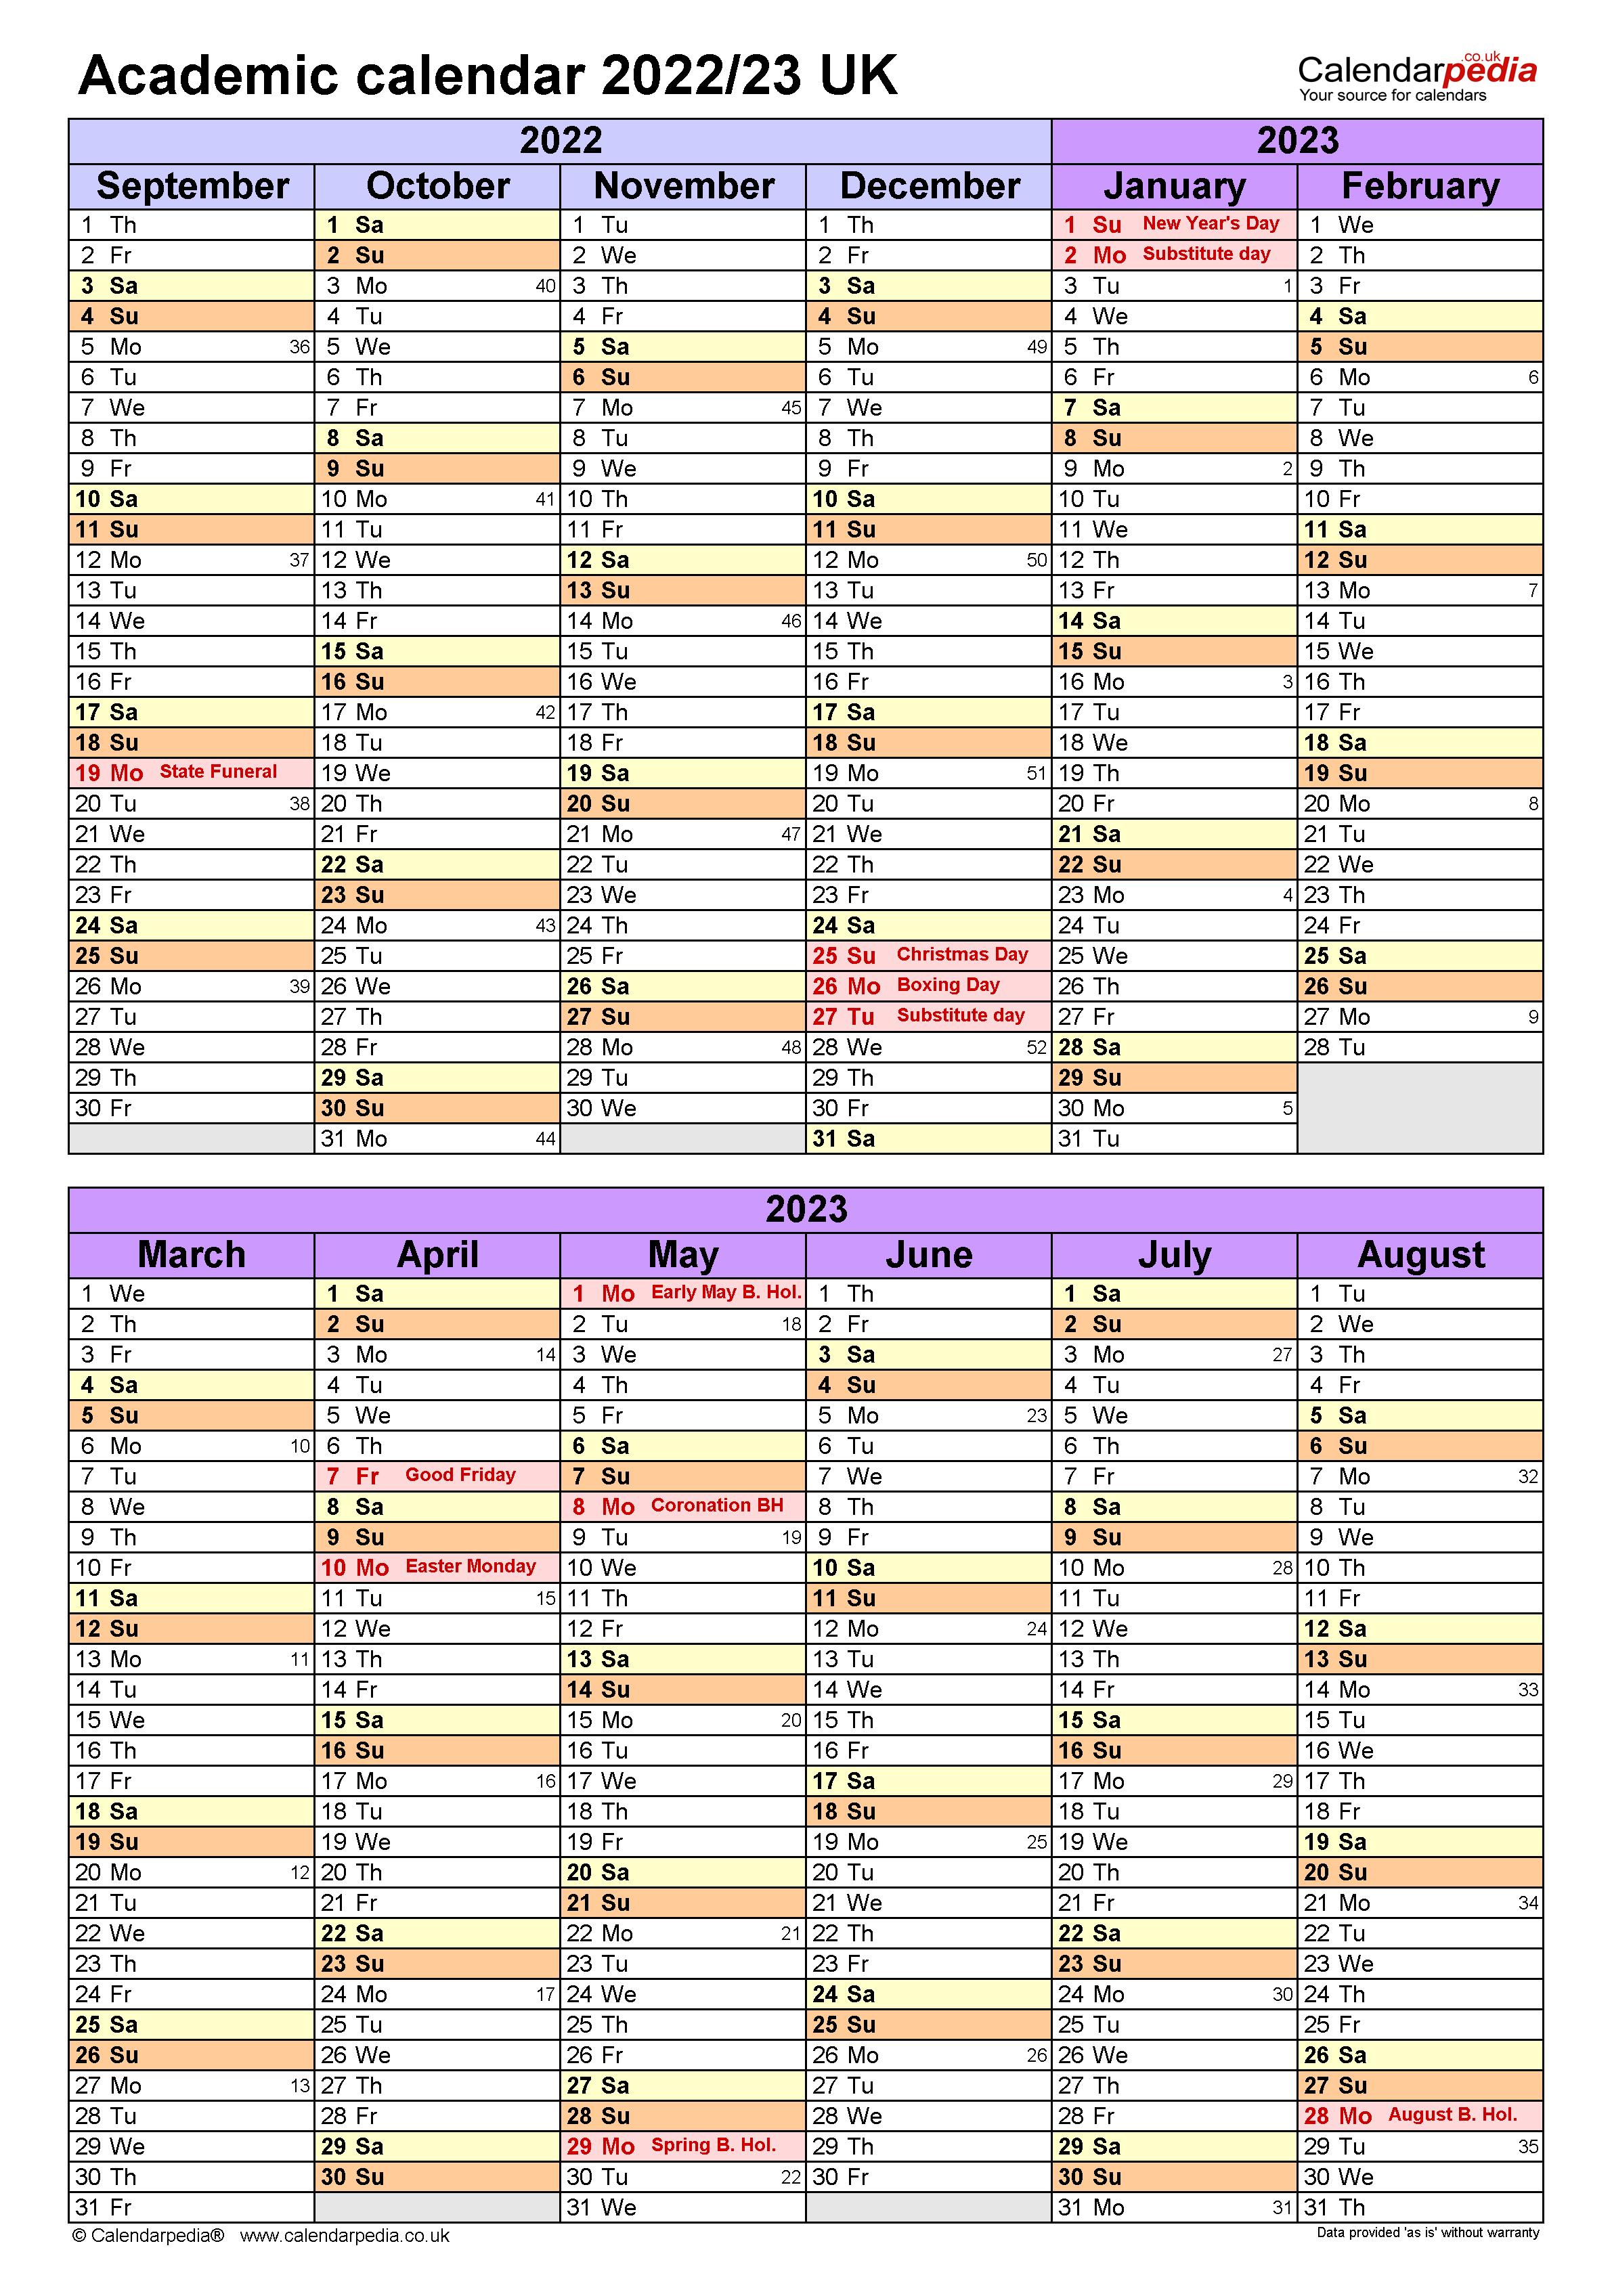 Bgsu Academic Calendar 2022 23.Academic Calendars 2022 23 Uk Free Printable Pdf Templates